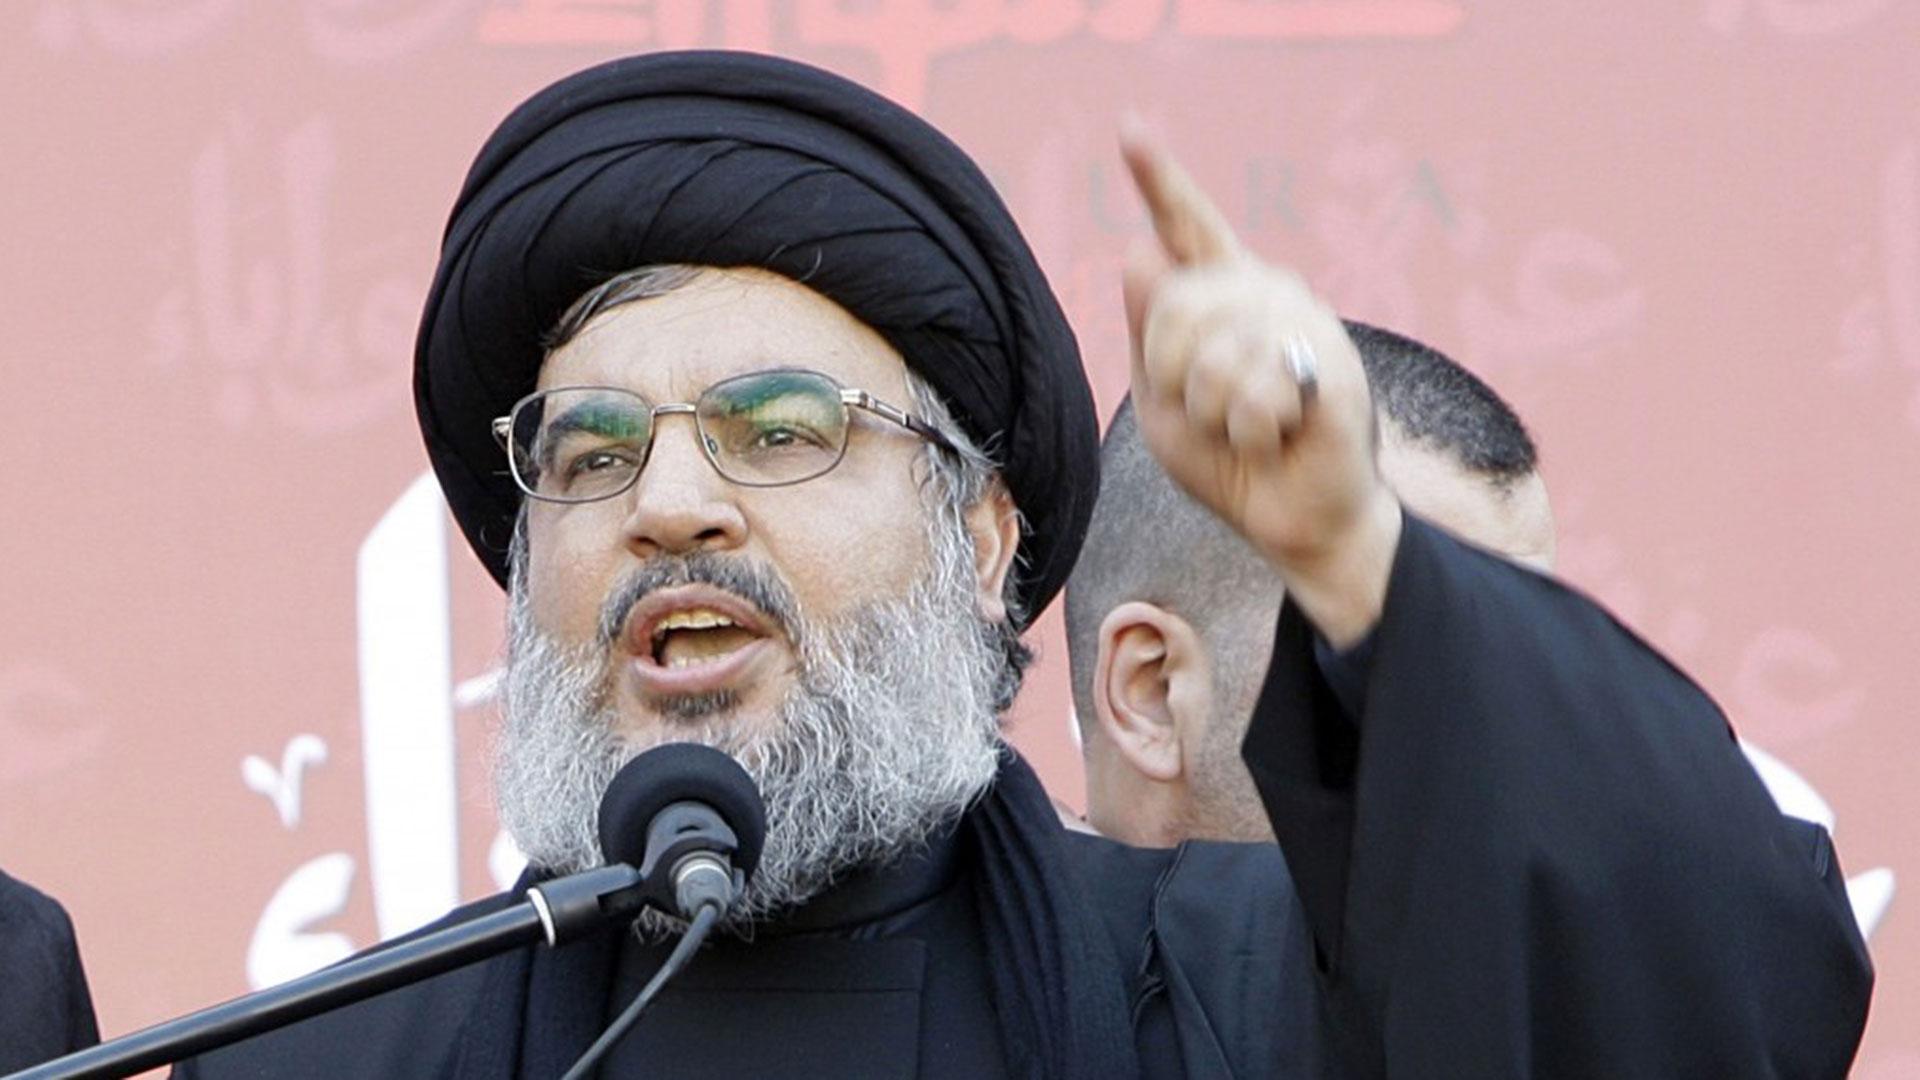 El jefe de Hezbollah, Sayyed Hassan Nasrallah.